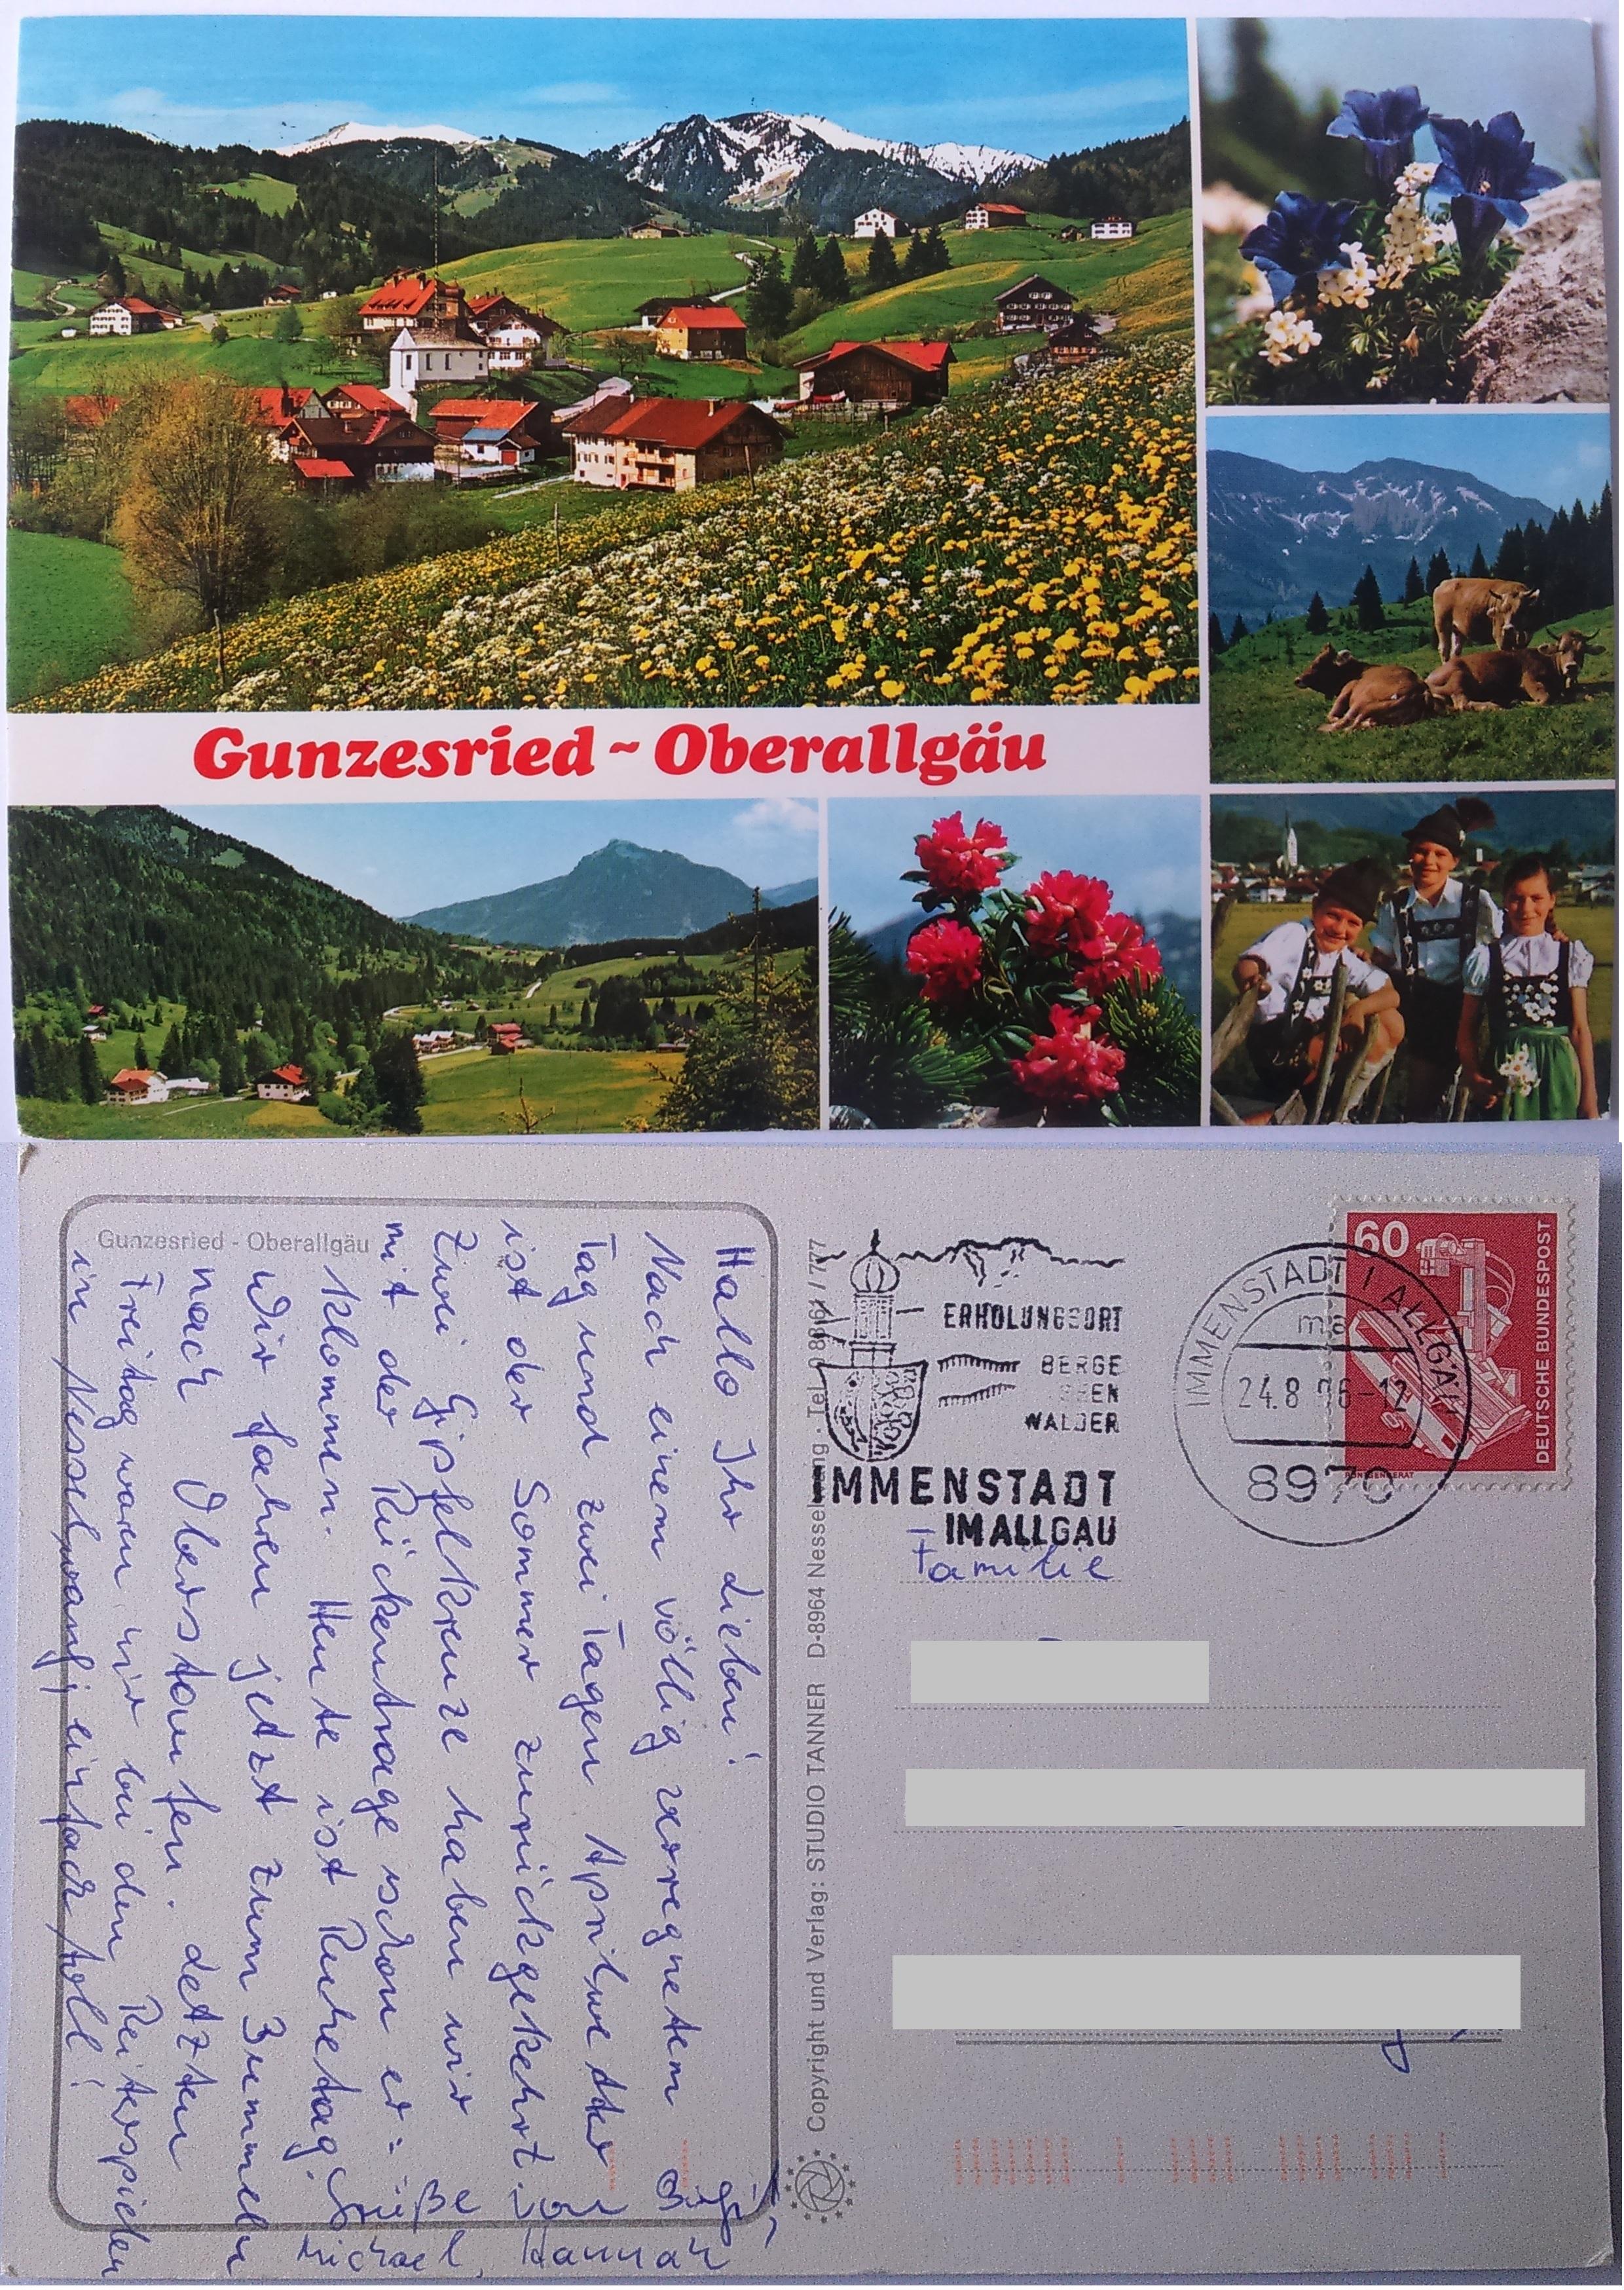 Gunzesried - Oberallgäu (24.08.1986) Immenstadt im Allgäu both